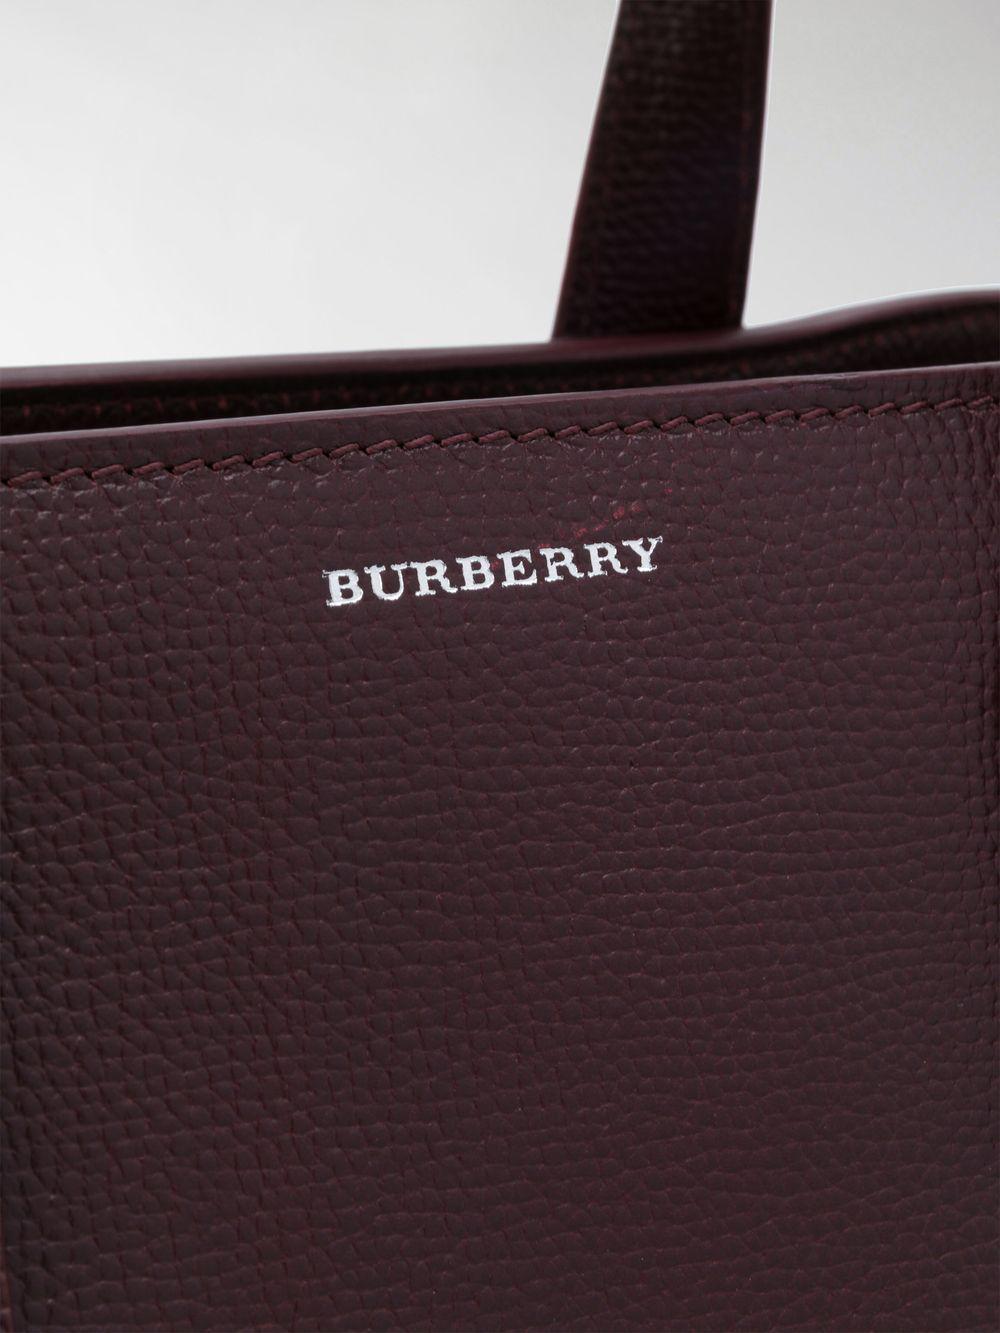 Burberry Medium Banner Bag in Red